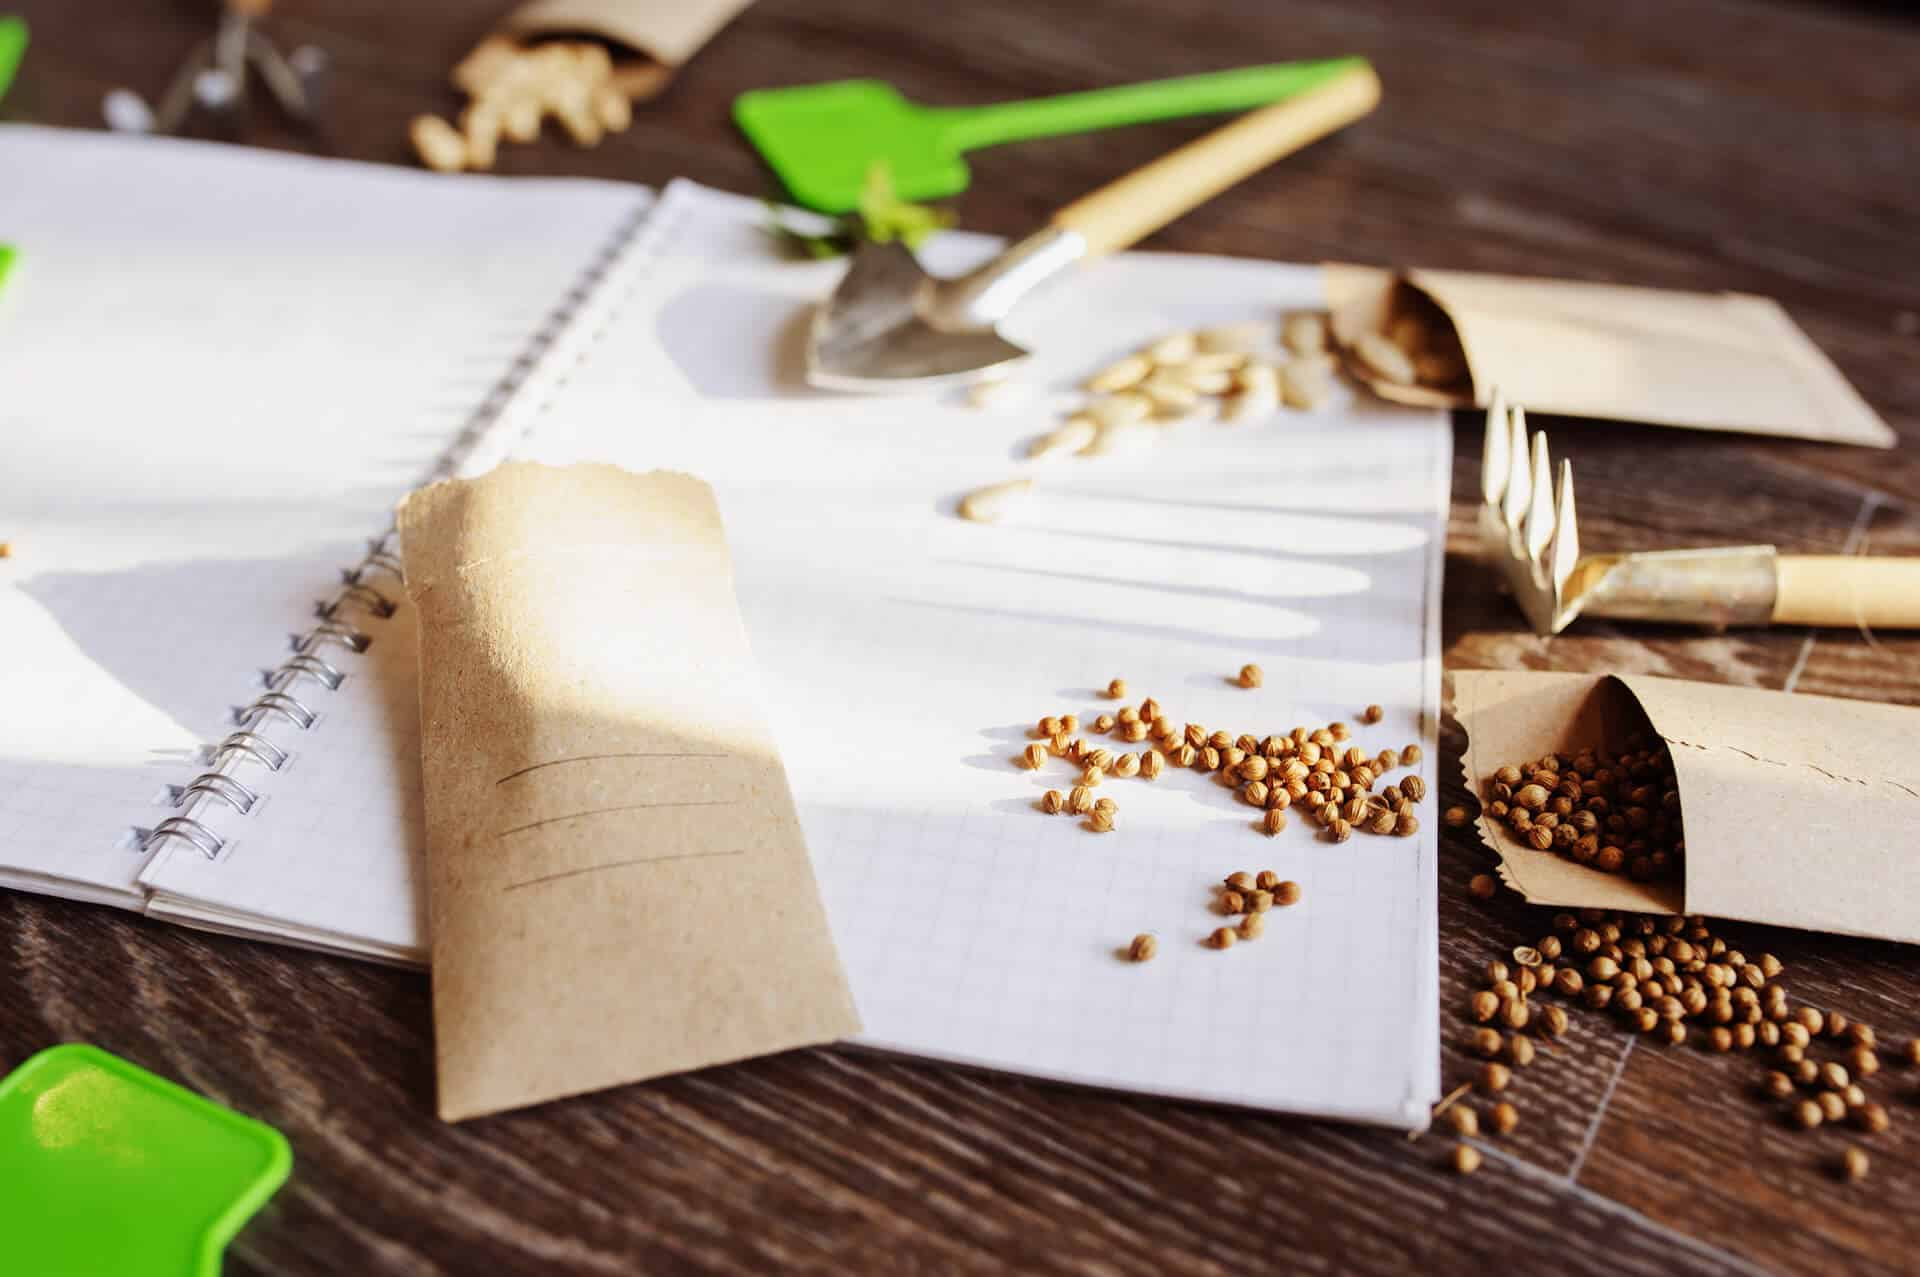 Zeszyt i nasiona